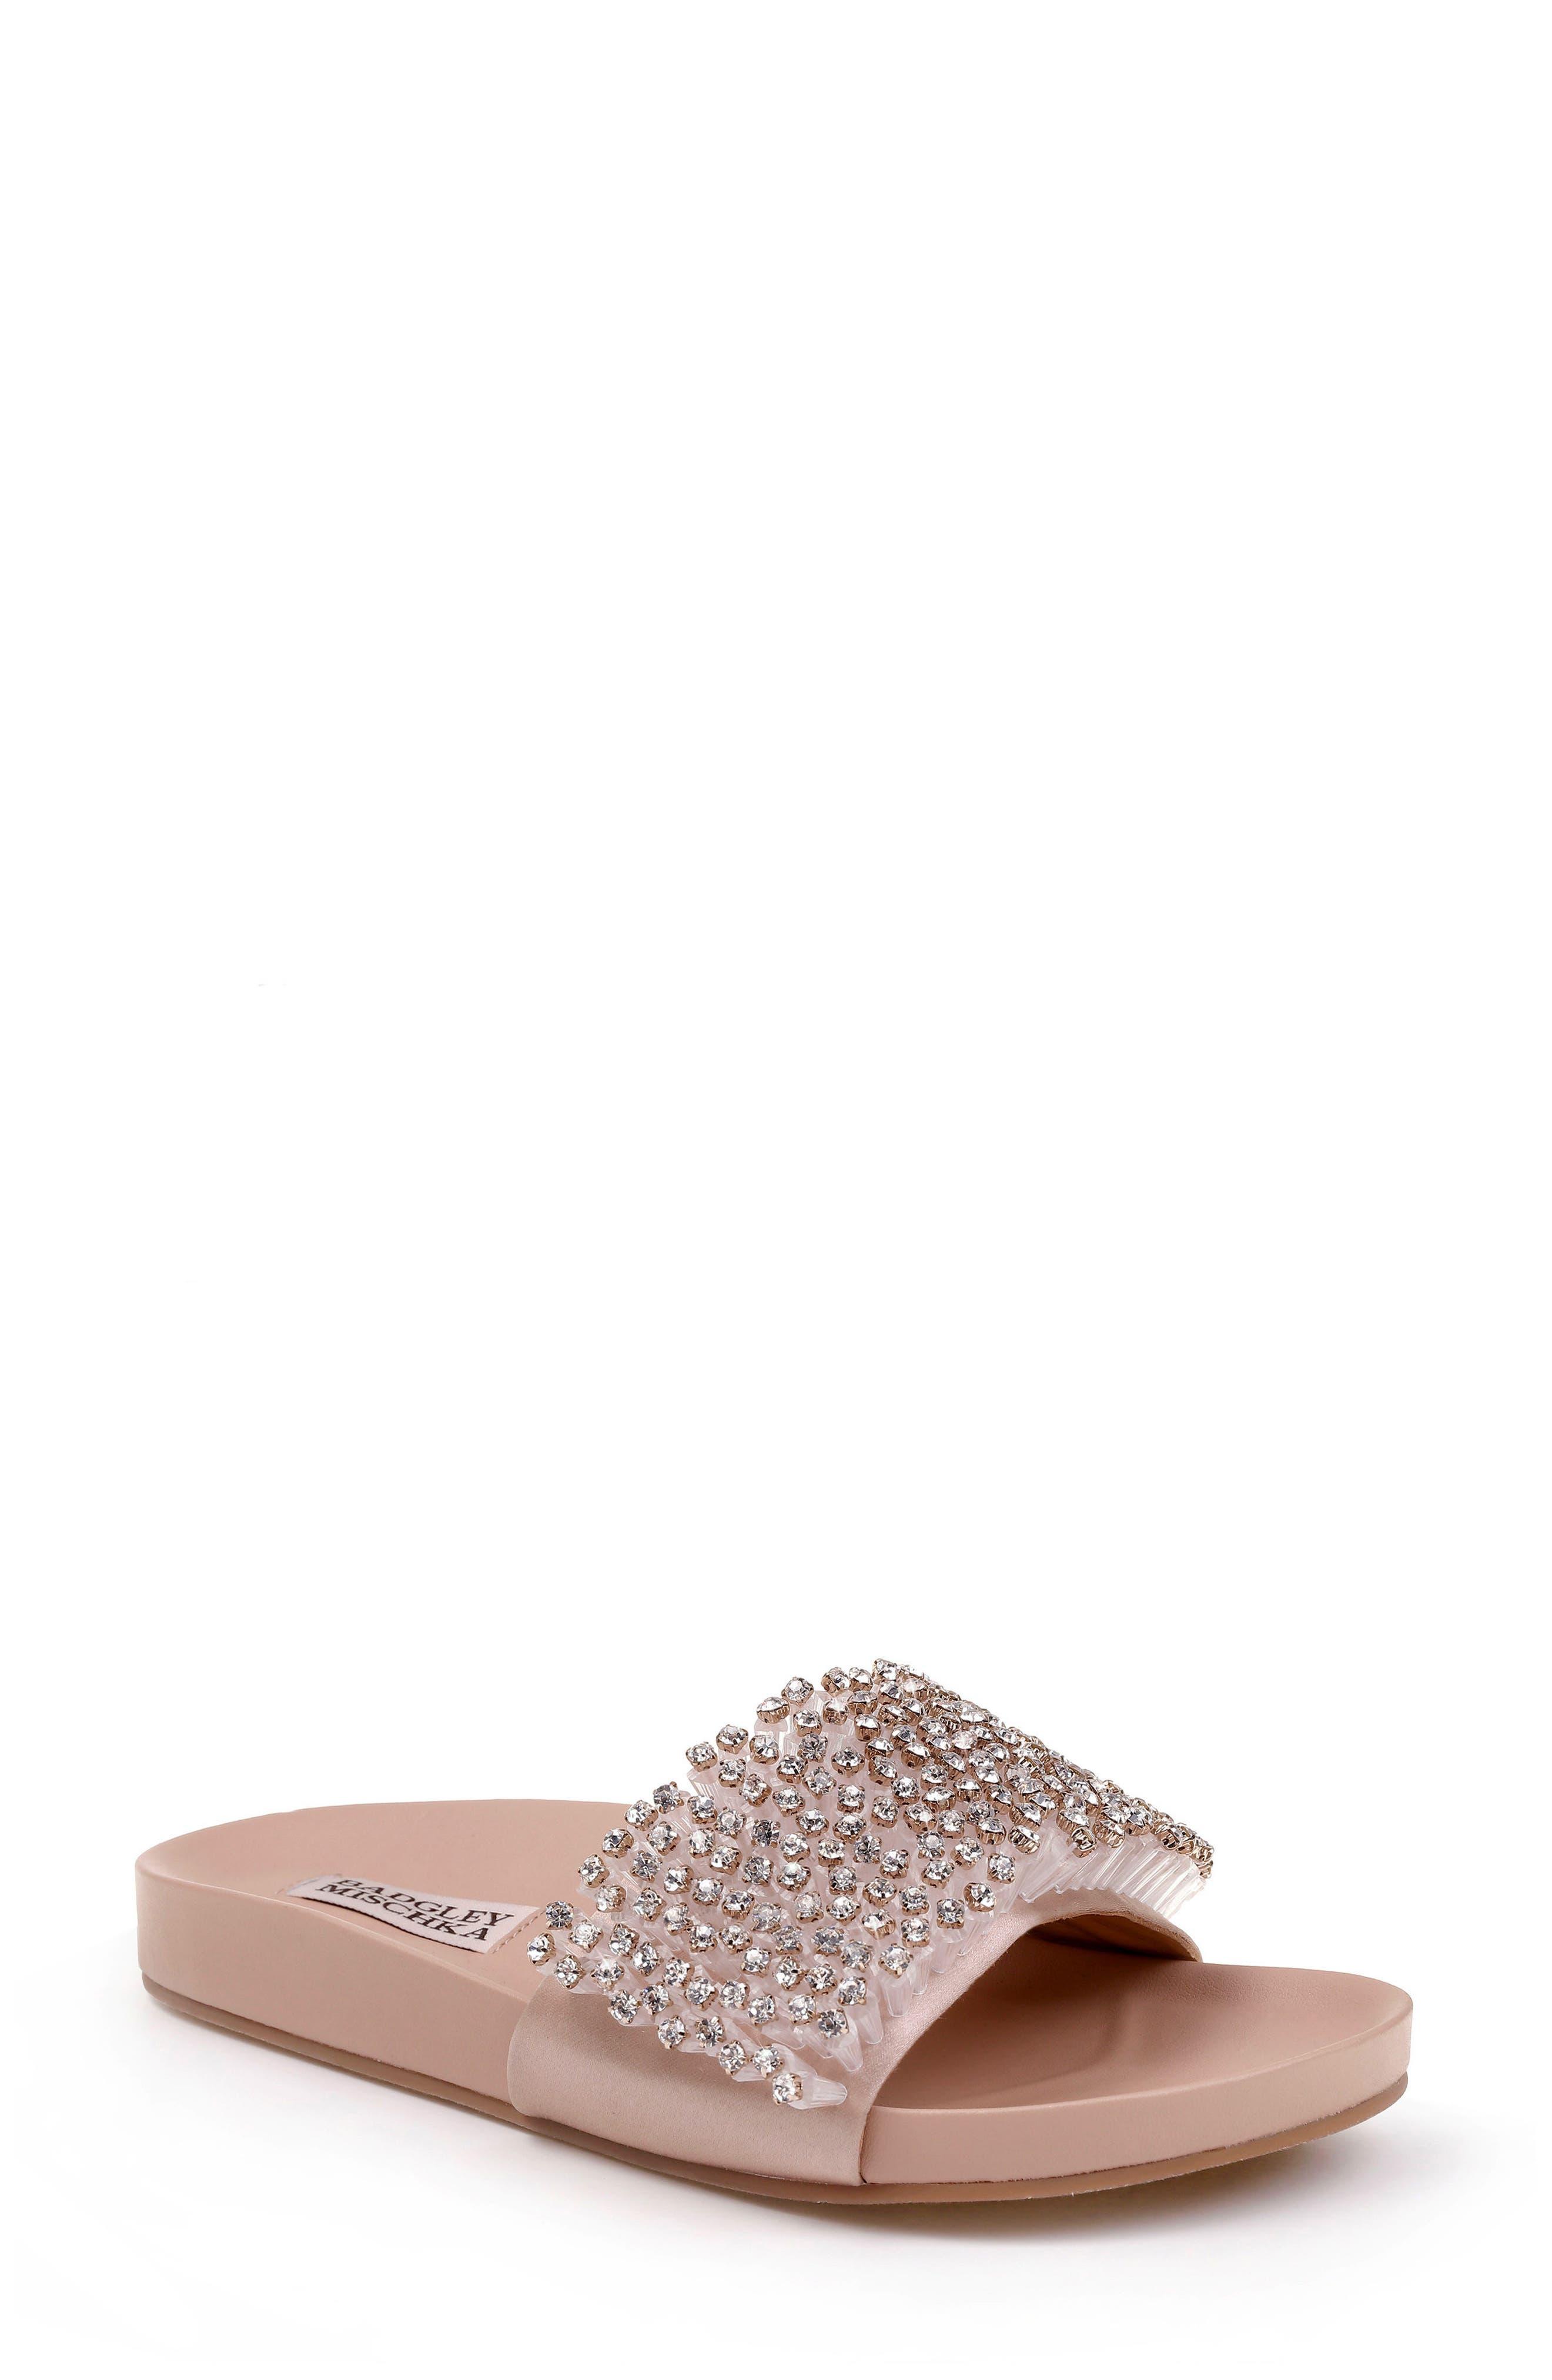 Horton Crystal Embellished Sandal,                             Main thumbnail 4, color,